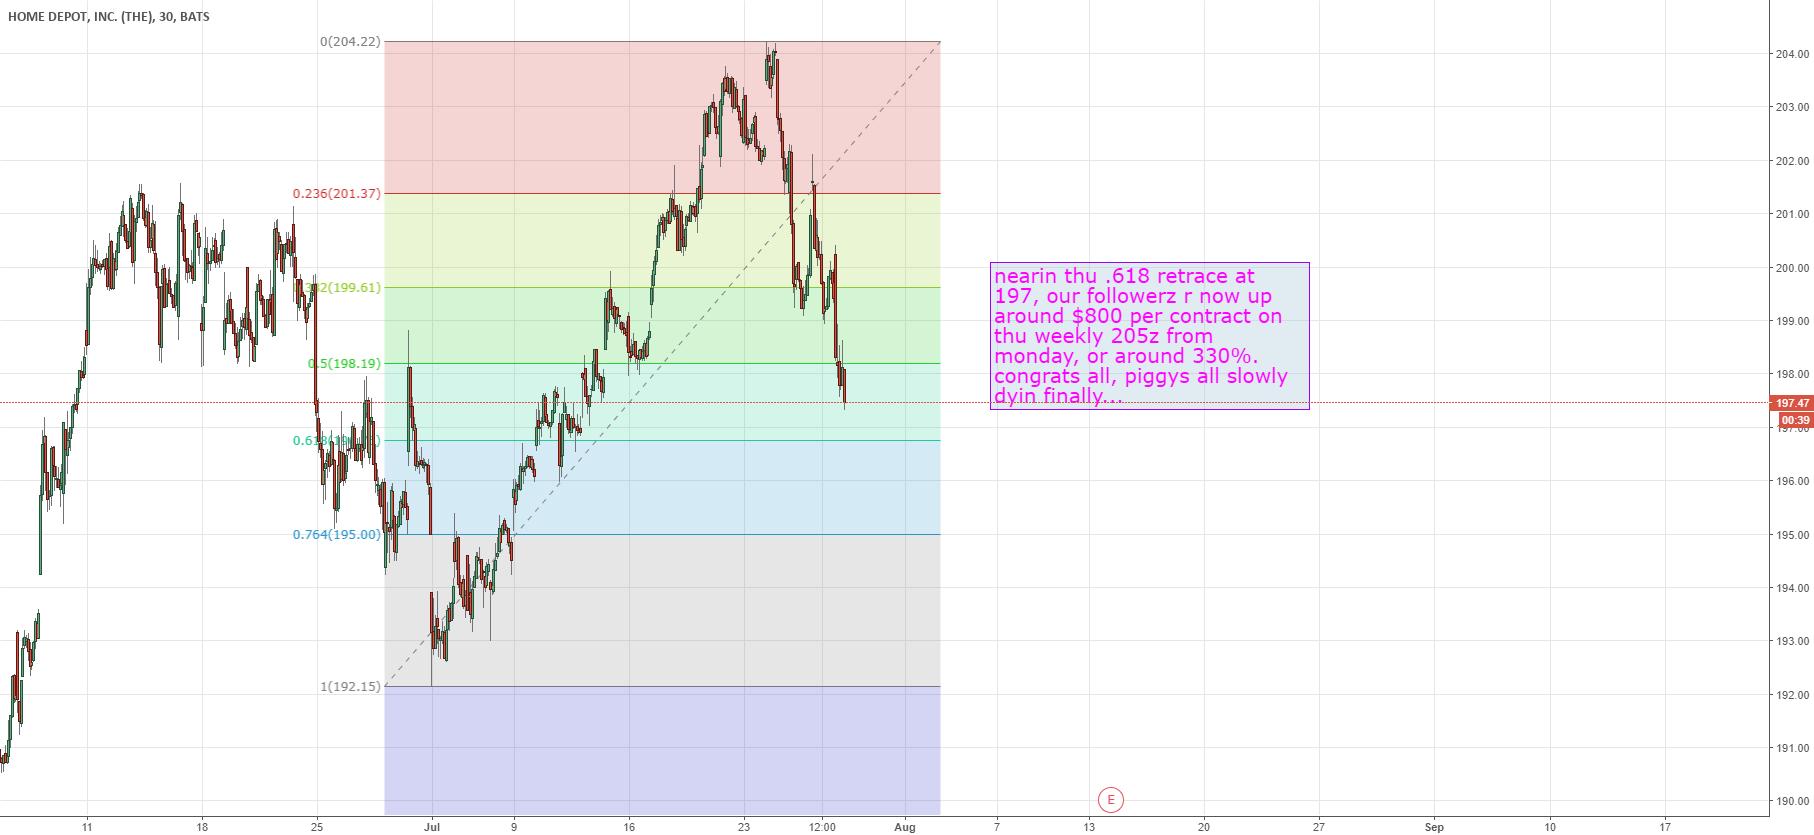 HD for NYSE:HD by nobullshytrader0 — TradingView